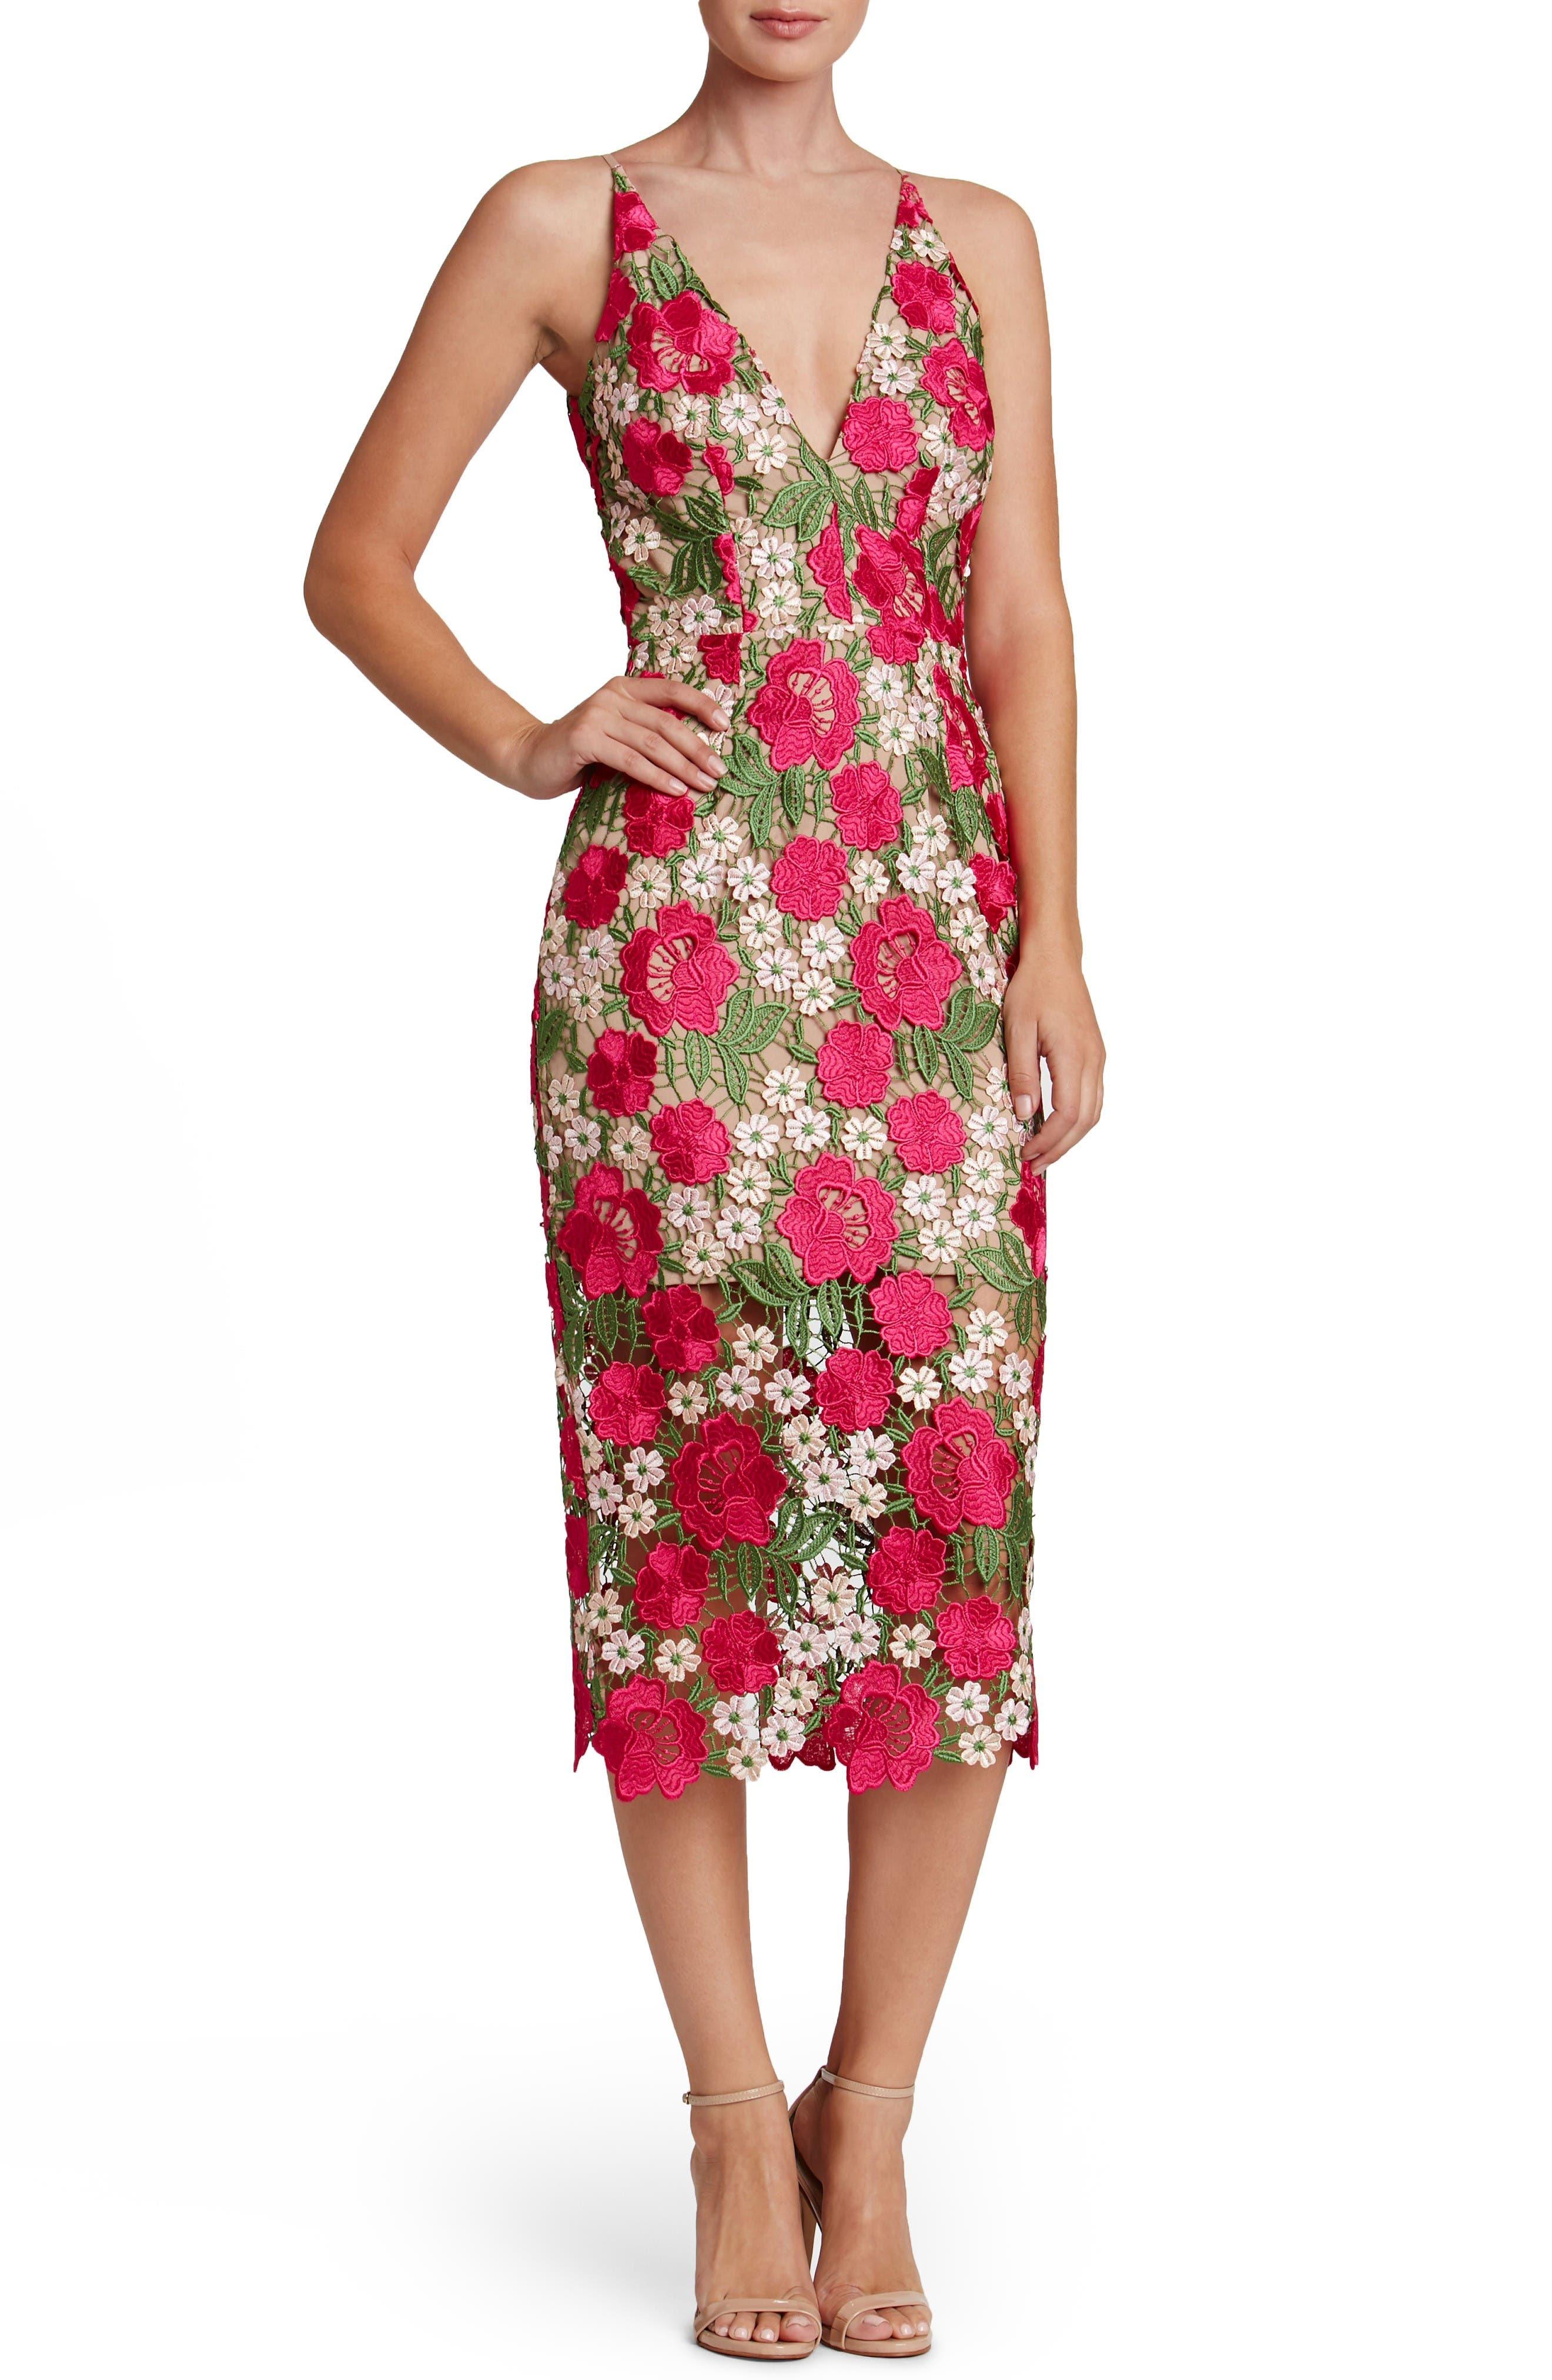 Alternate Image 1 Selected - Dress the Population Aurora Floral Crochet Midi Dress (Nordstrom Exclusive)